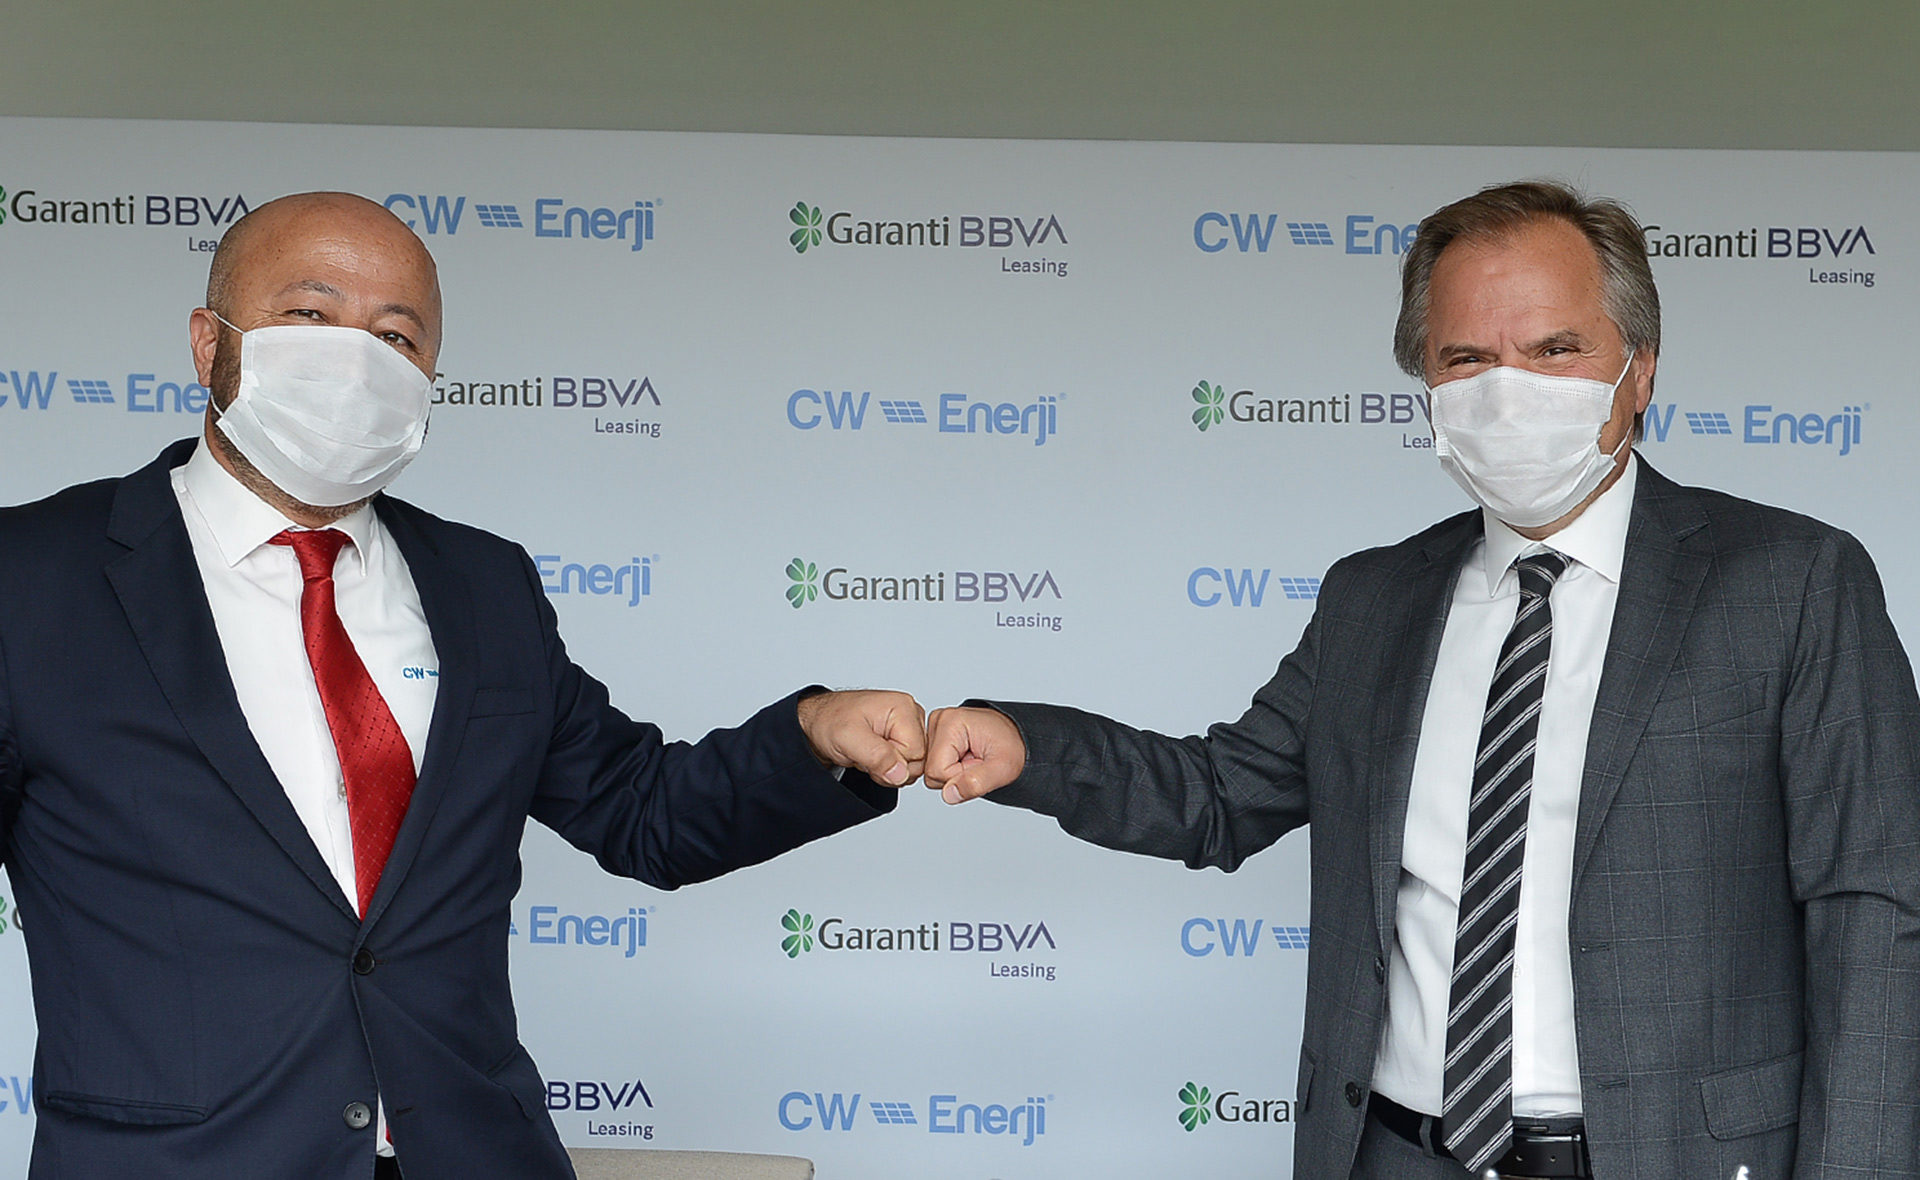 Garanti-BBVA-Leasing-CW-Energy-acuerdo-Turquía